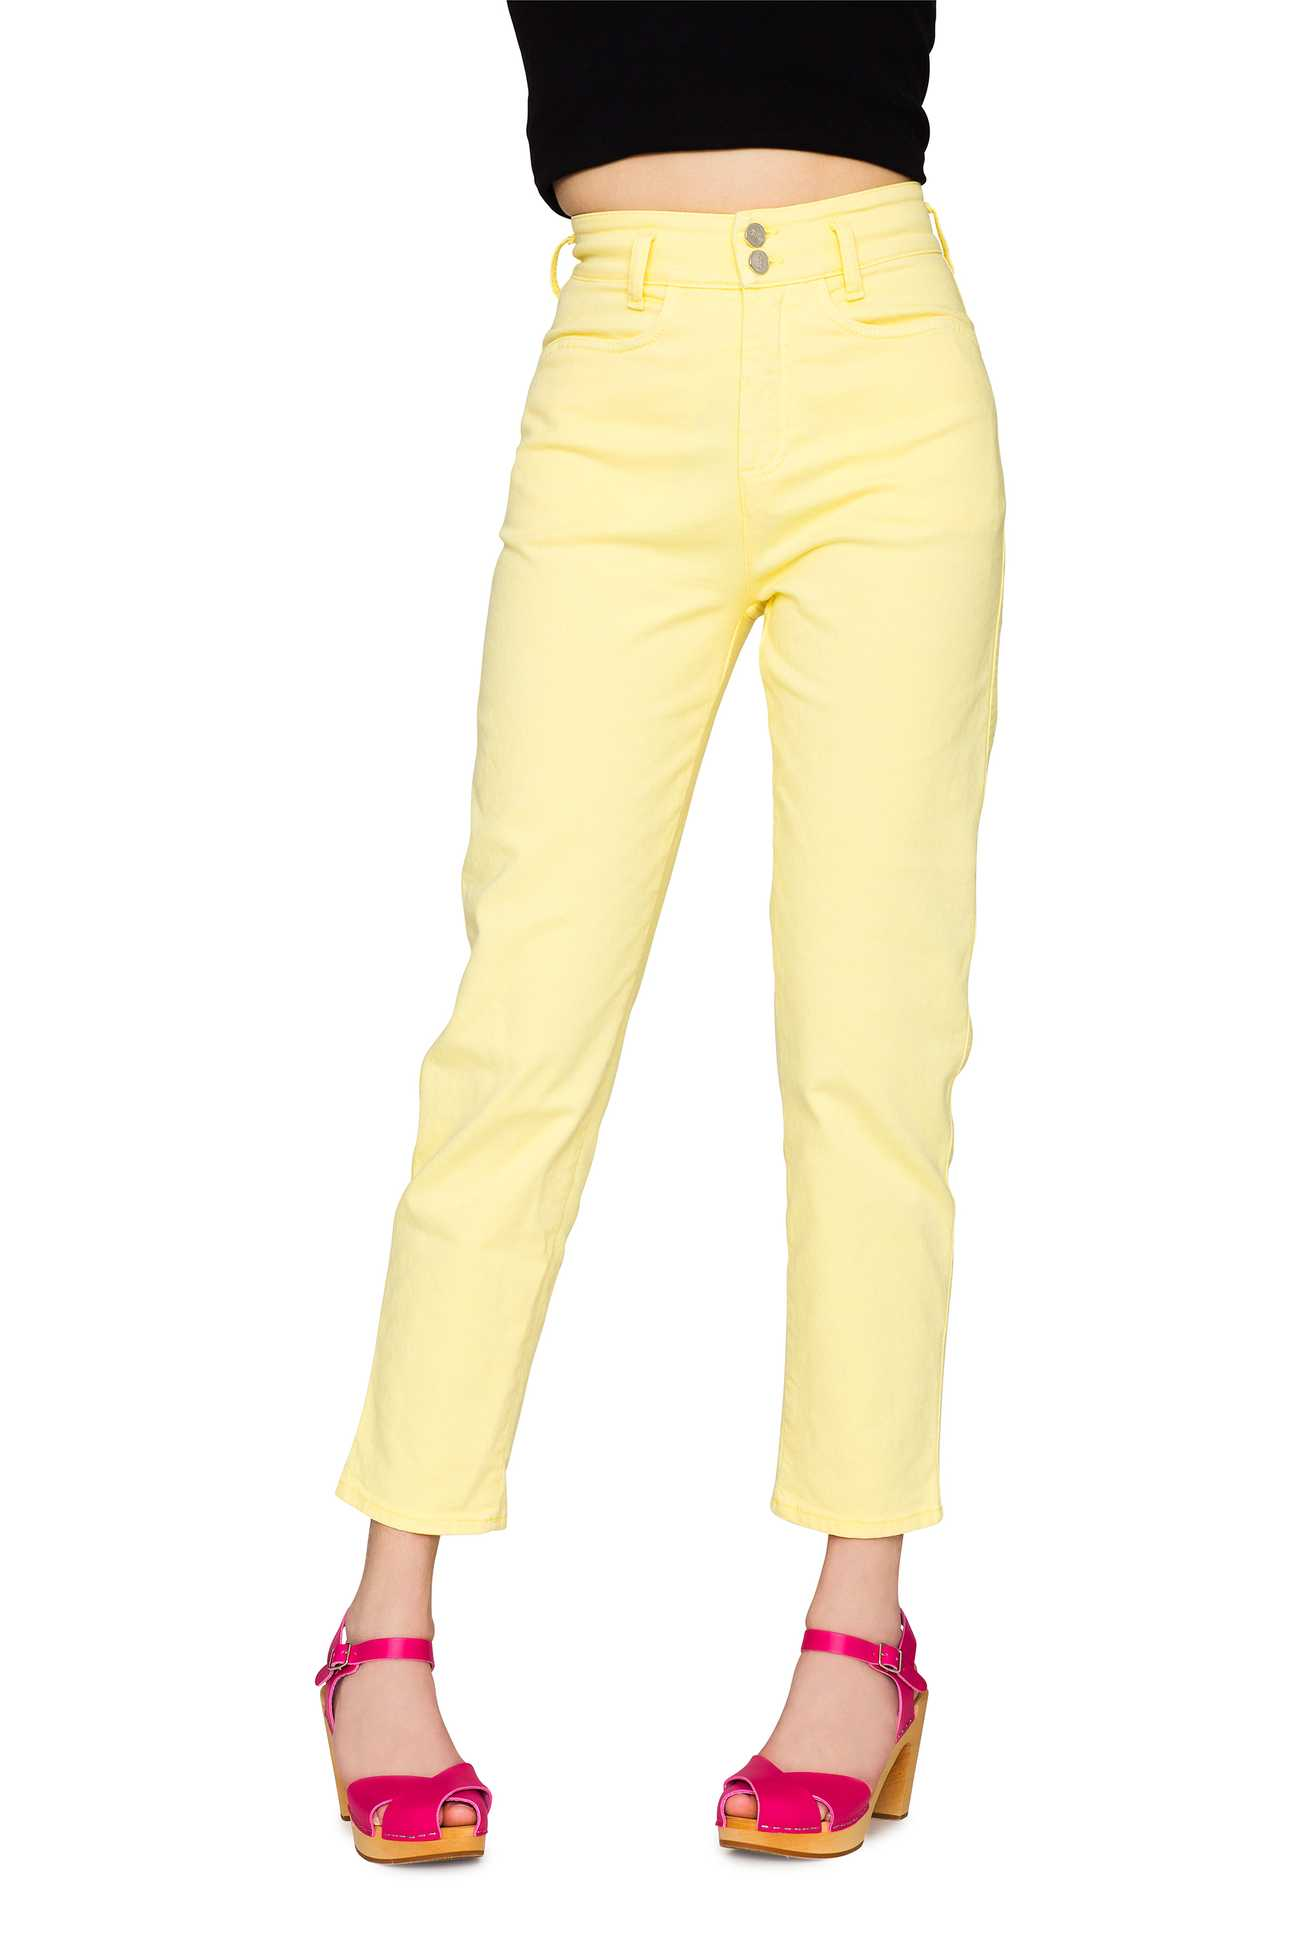 Mom Jeans Denim Pastel Yellow